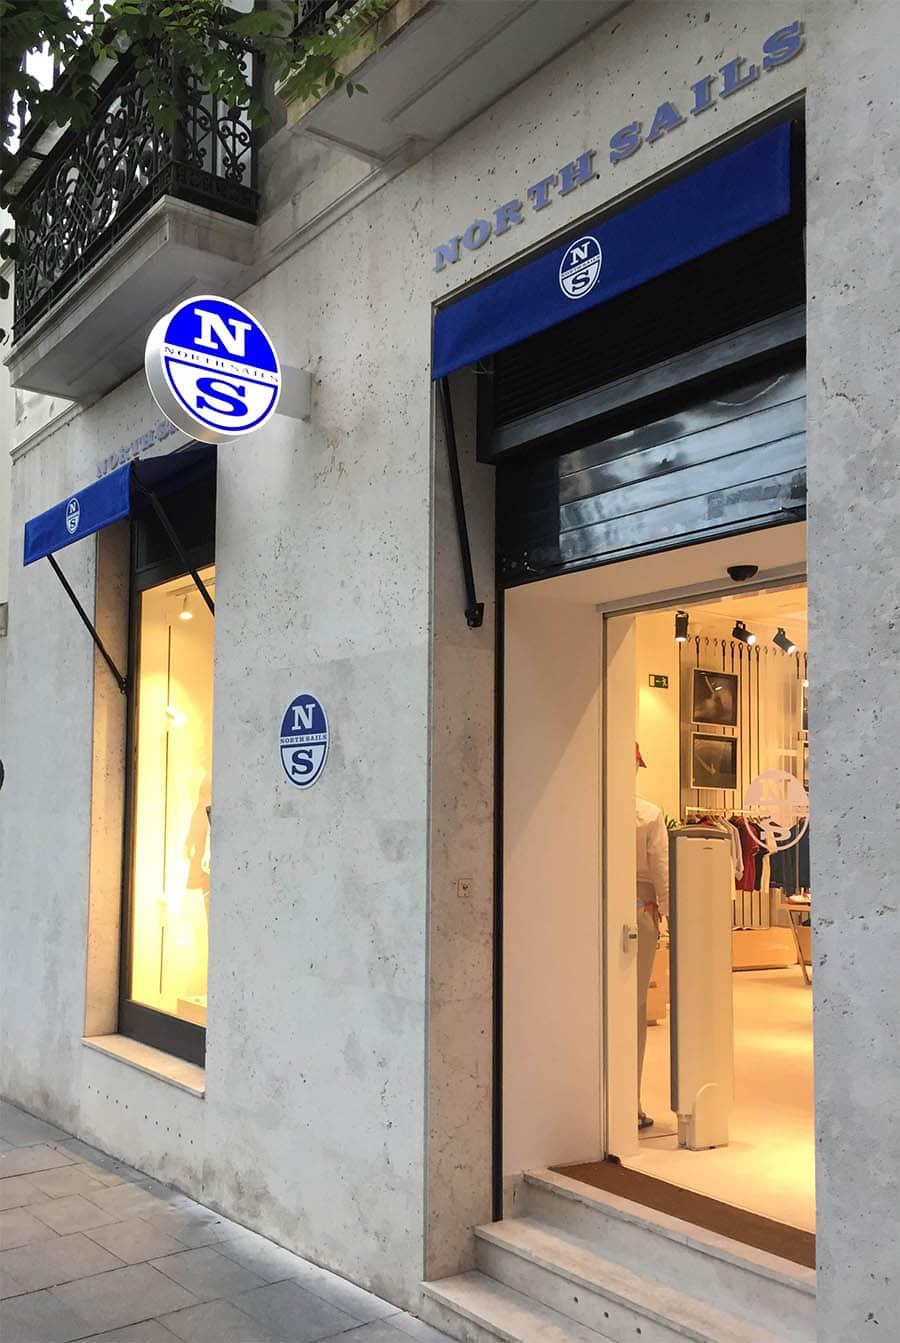 instore-clientes-north-sails-produccion-rotulo-luminoso